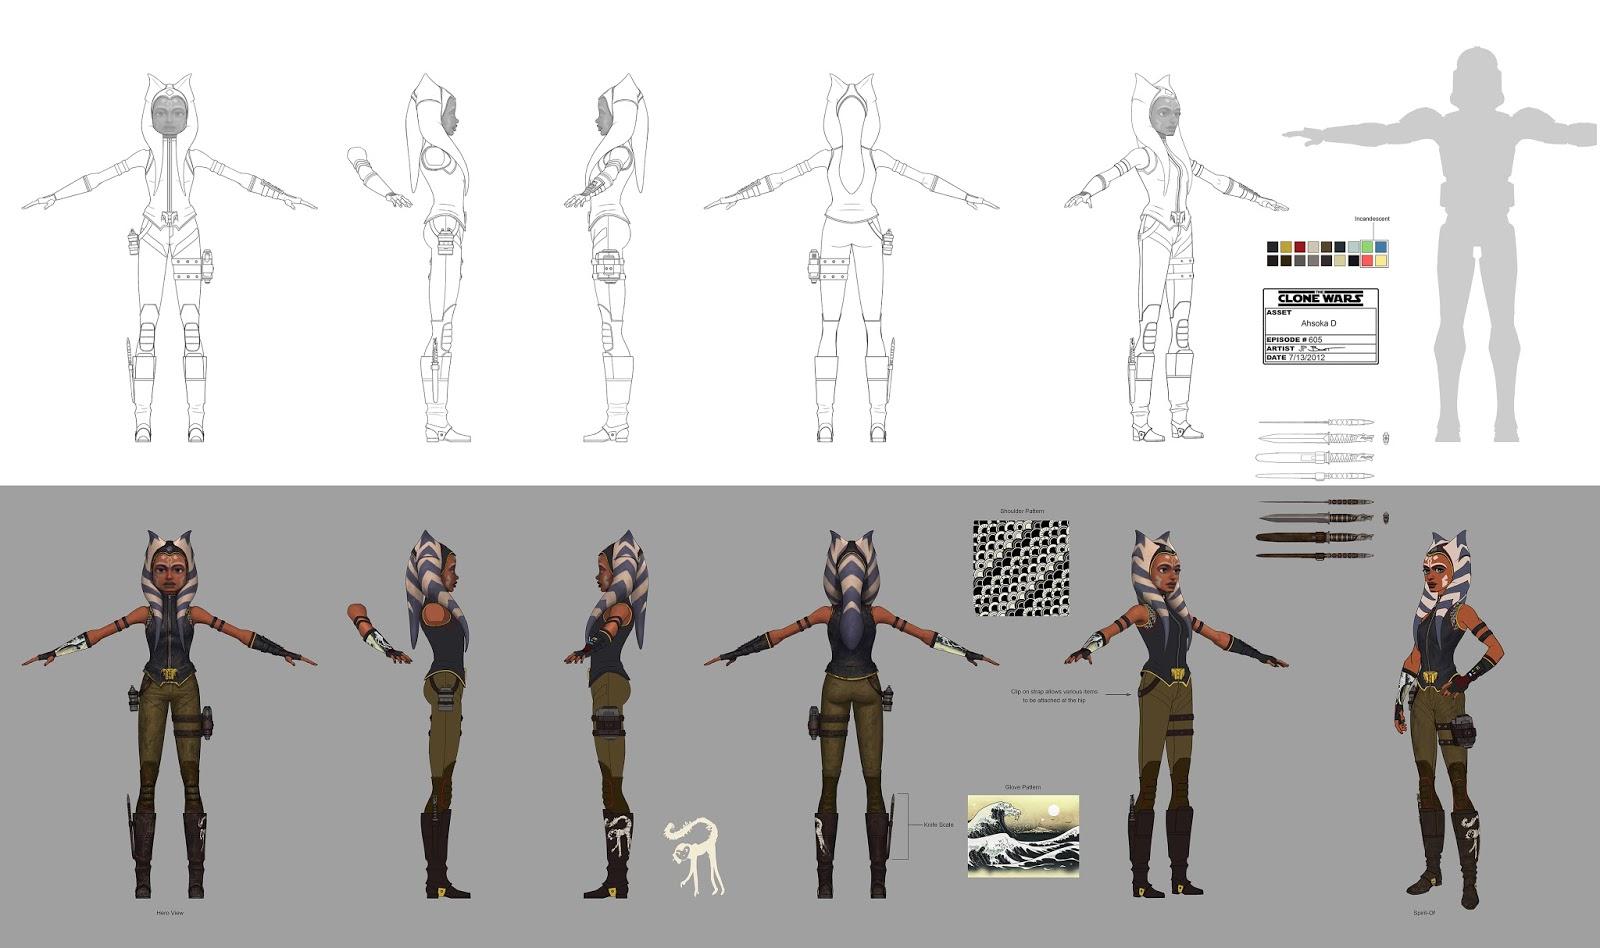 star wars clonetrooper concept - photo #4